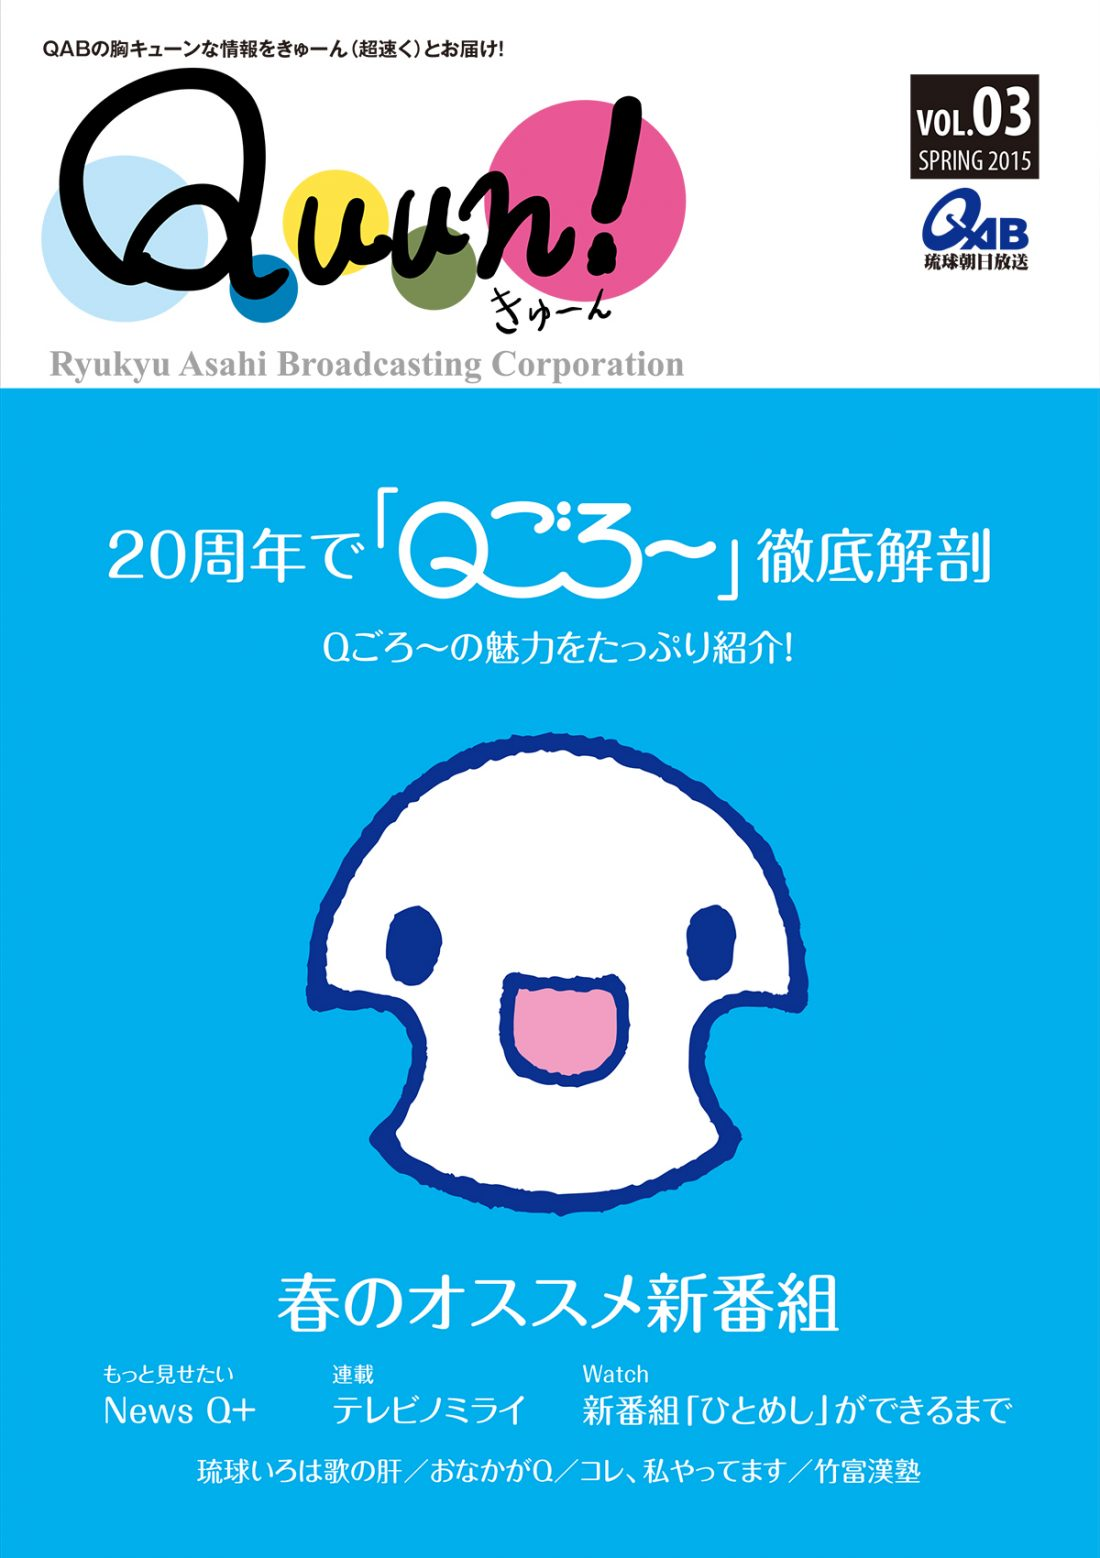 https://www.qab.co.jp/qgoro/wp-content/uploads/quun_0301-1100x1558.jpg